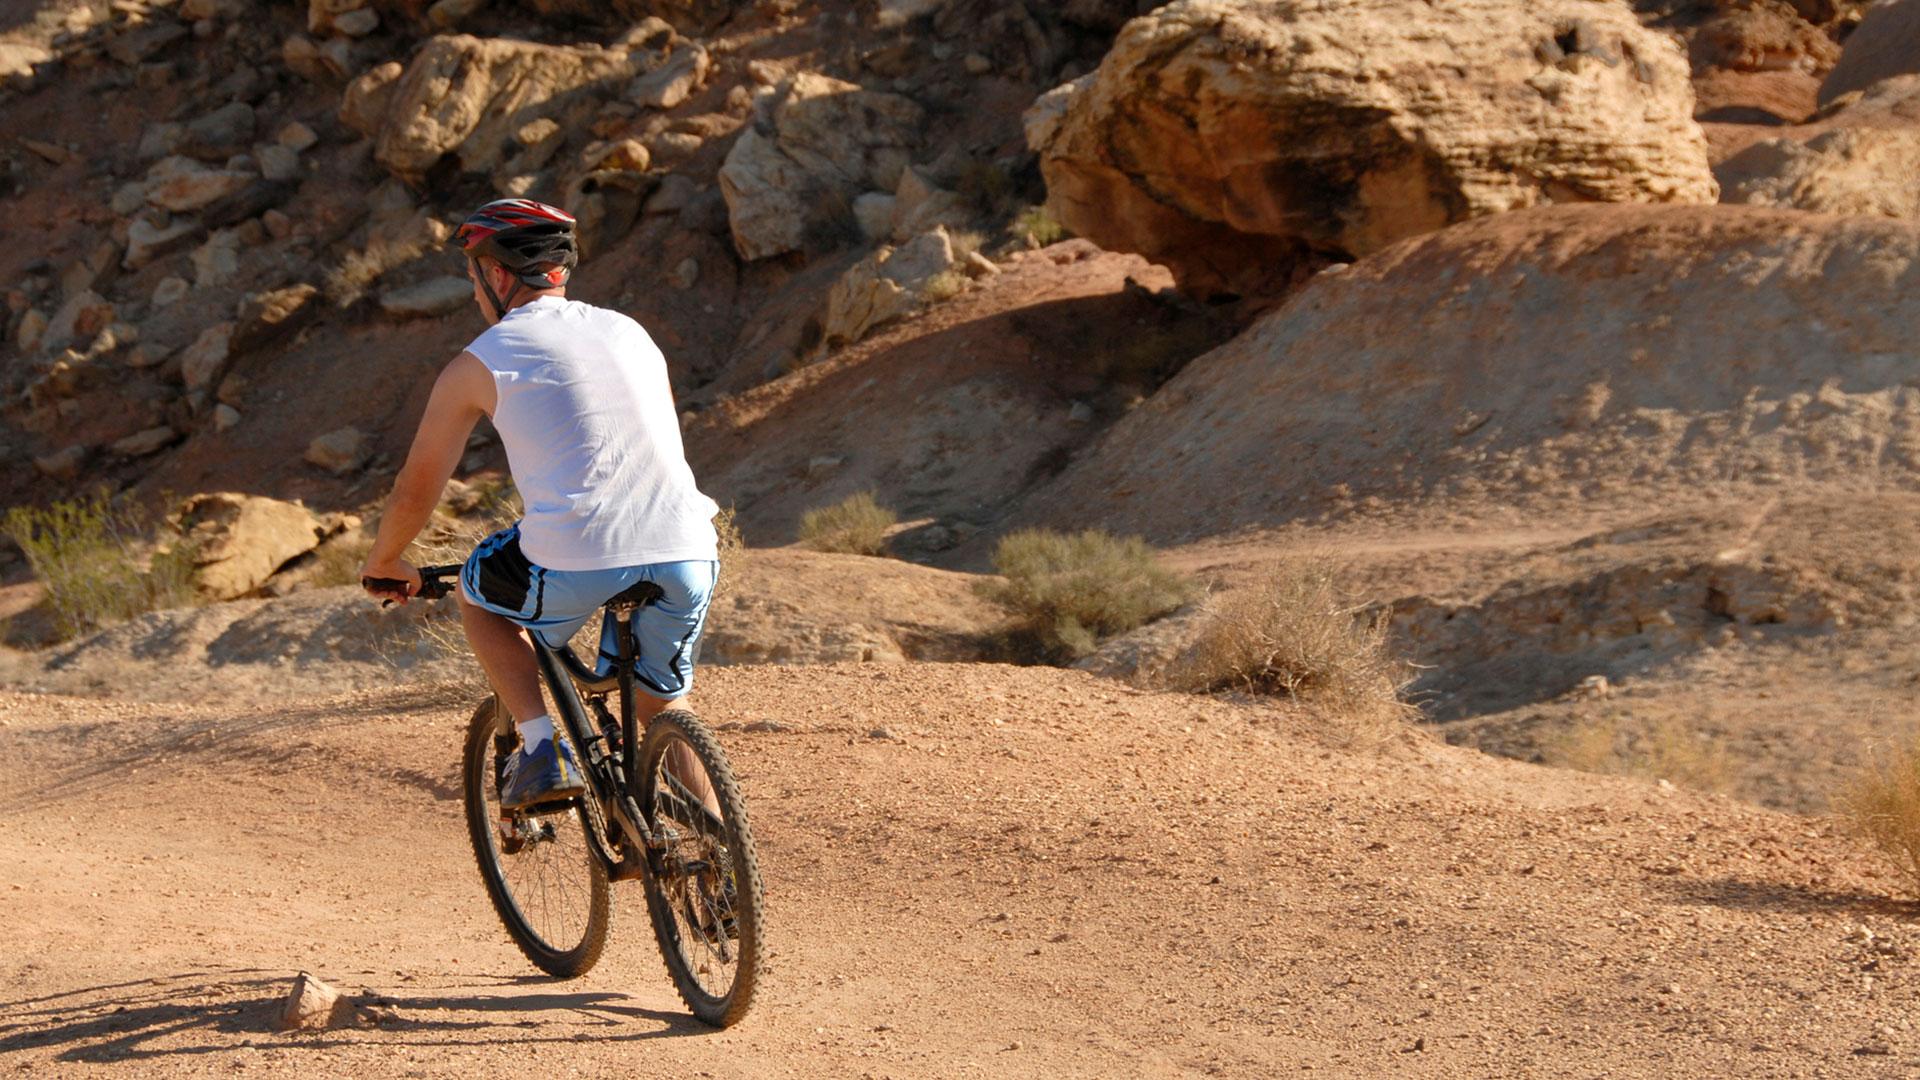 mountain biking in greater palm springs